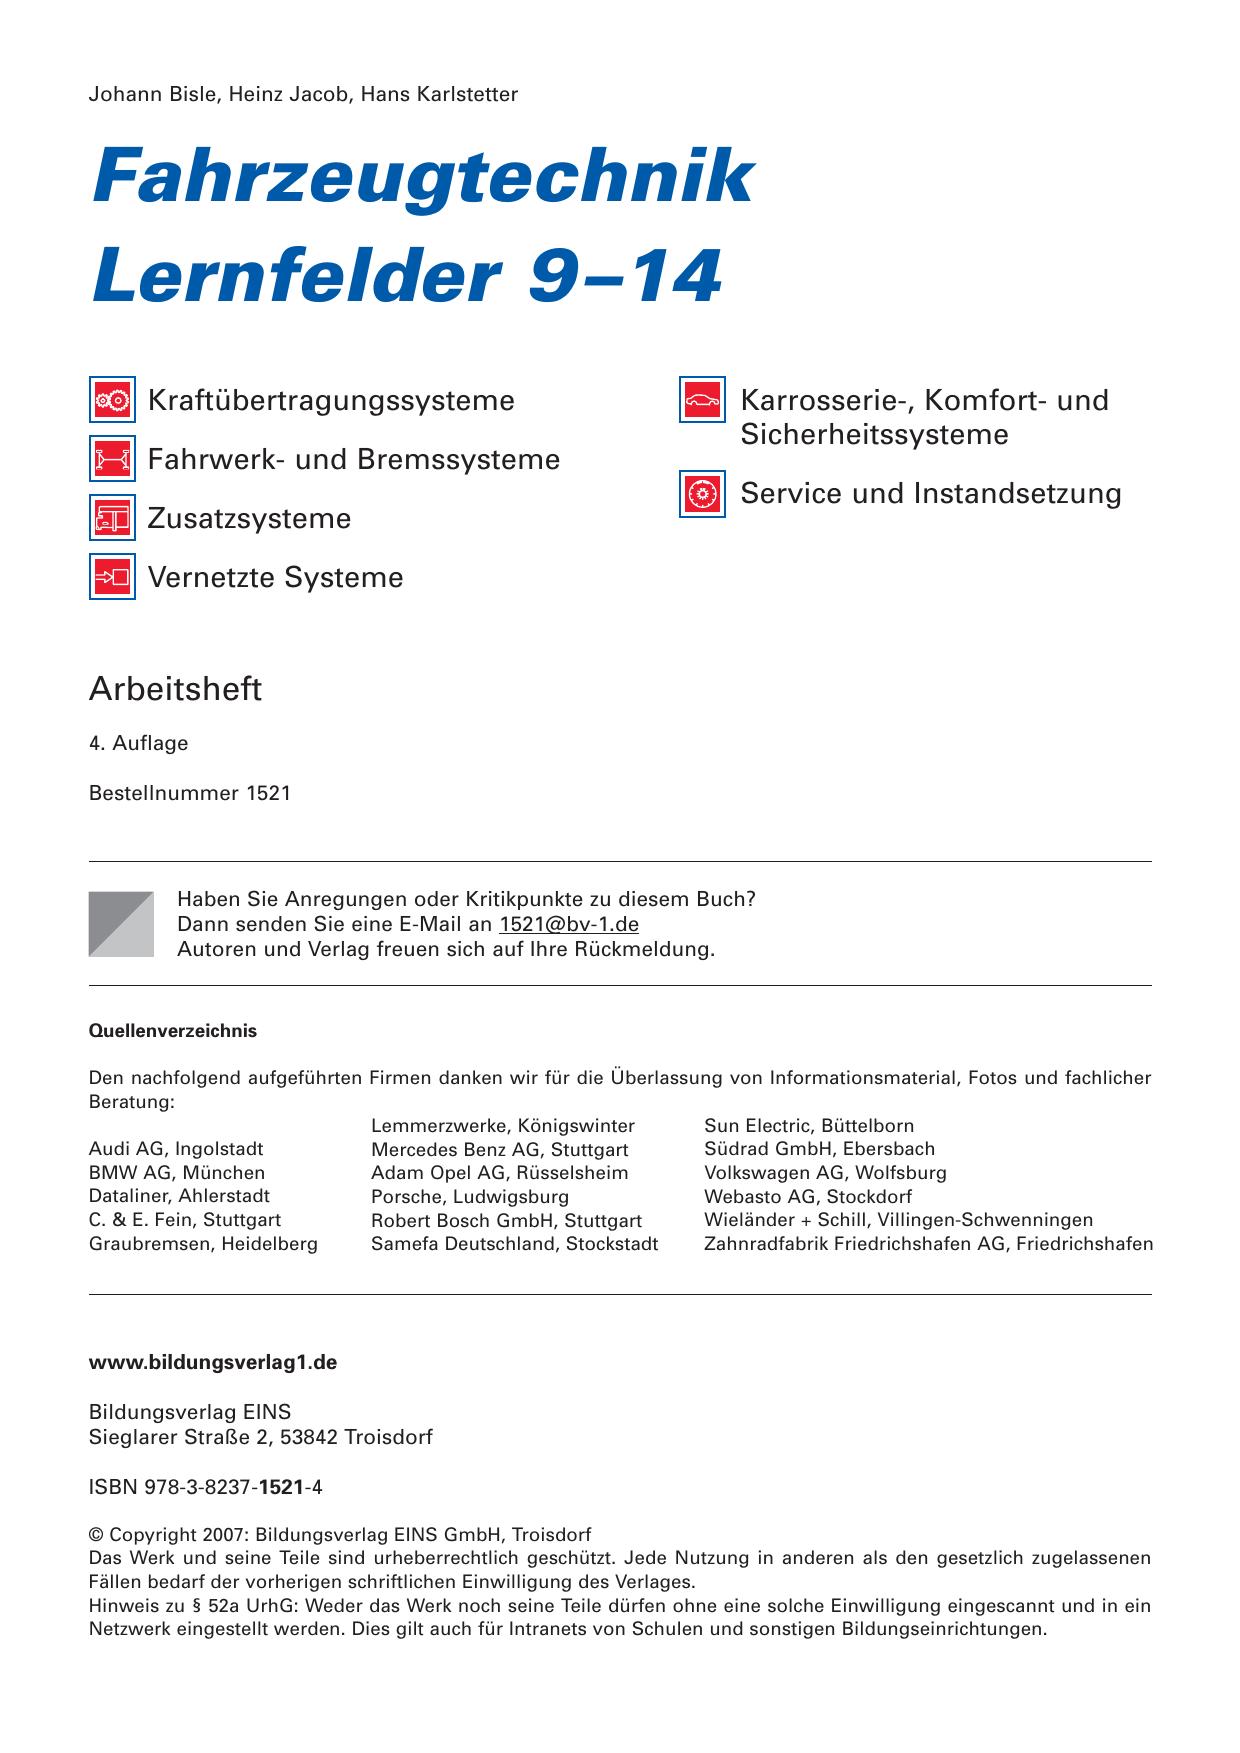 Fahrzeugtechnik Lernfelder 9–14 | manualzz.com